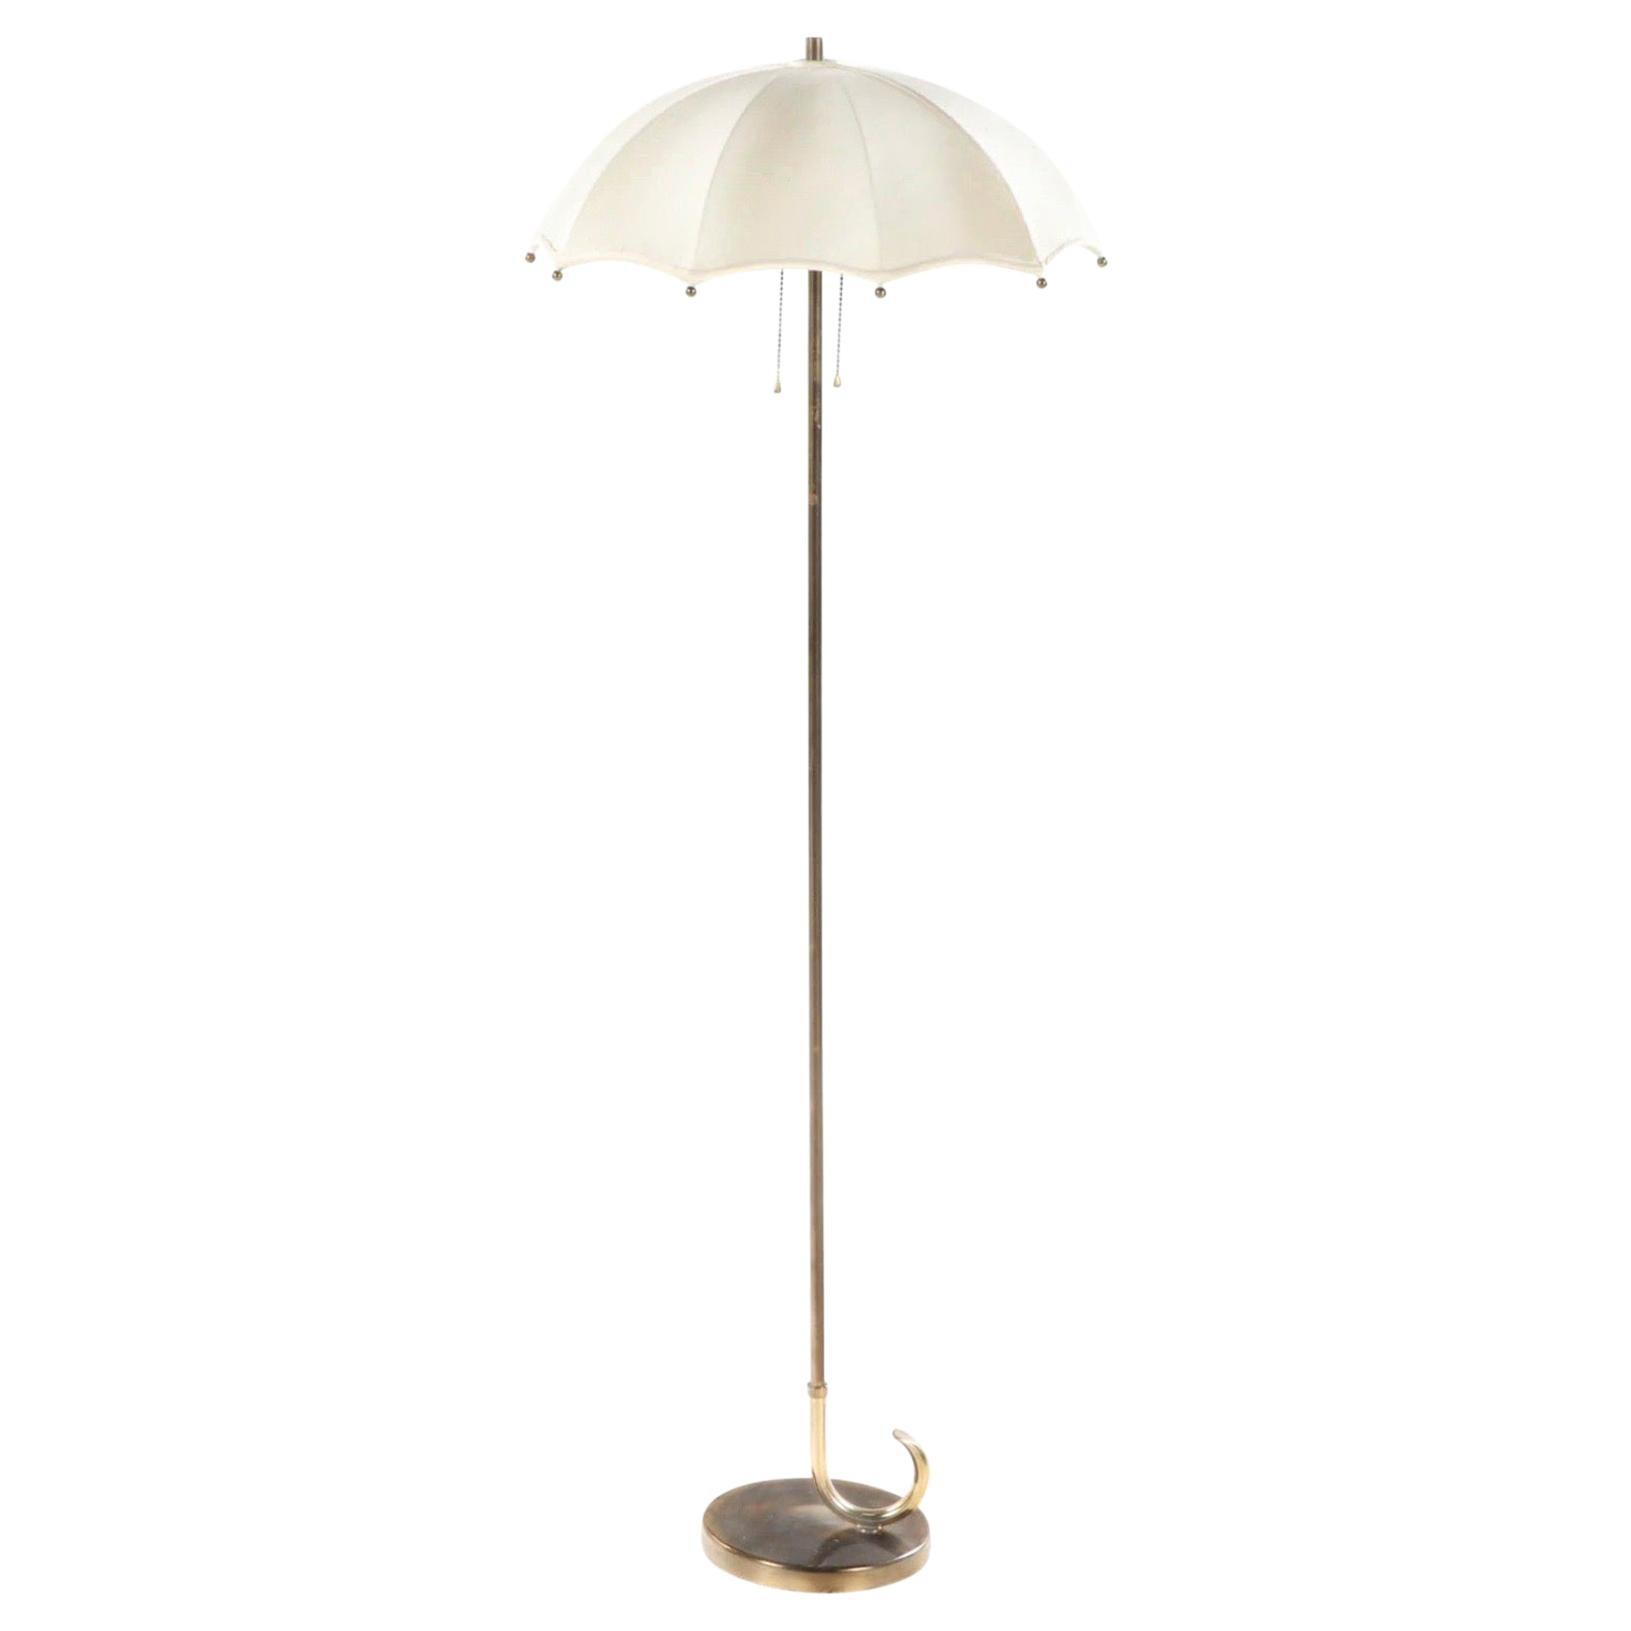 Gilbert Rohde for Mutual Sunset Lamp Company Brass Umbrella Floor Lamp, 1930s